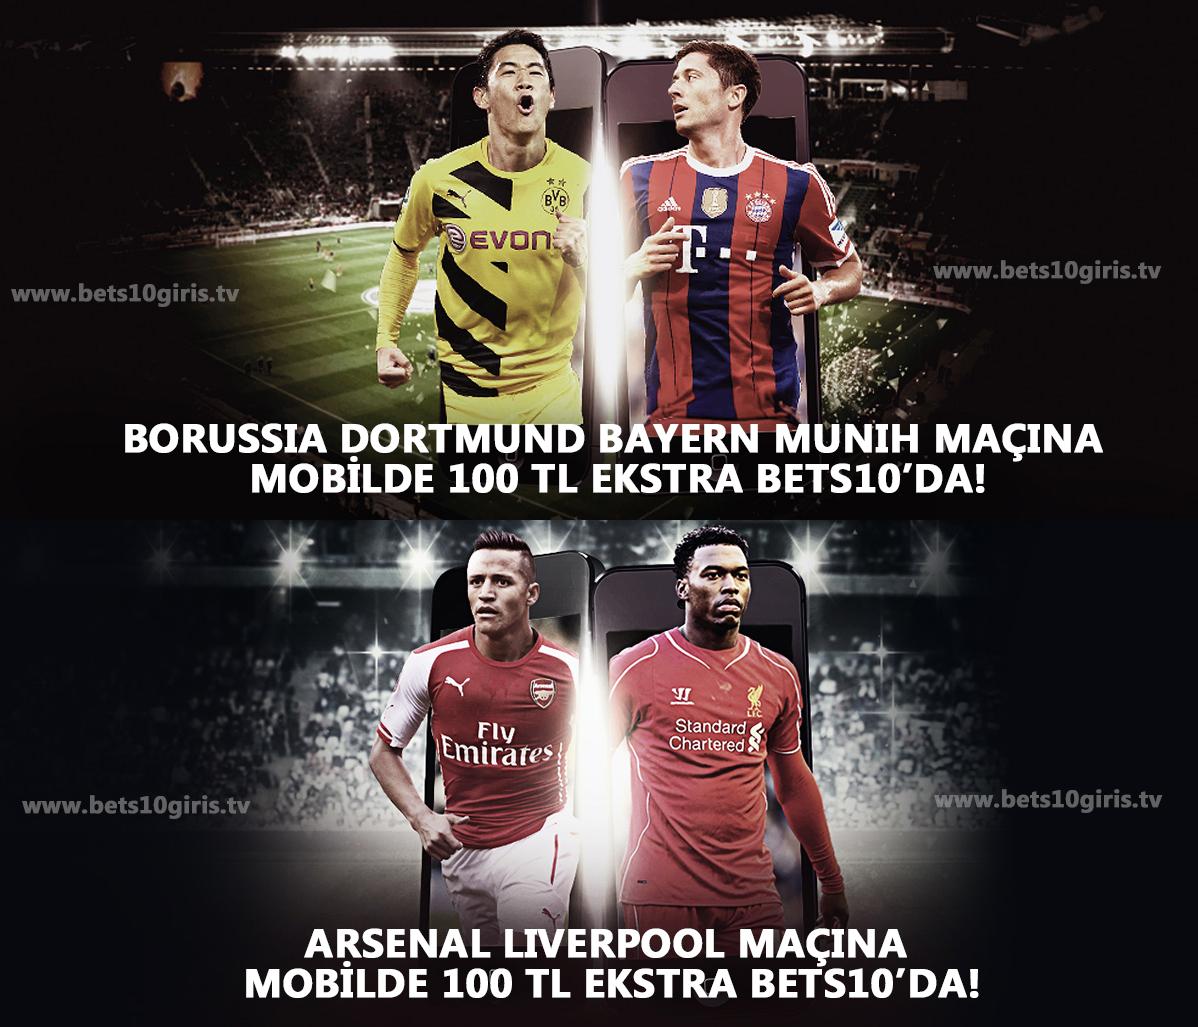 Borussia Dortmund – Bayern Munih,  Arsenal-Liverpool maçına Bets10 da 200 TL Bonus